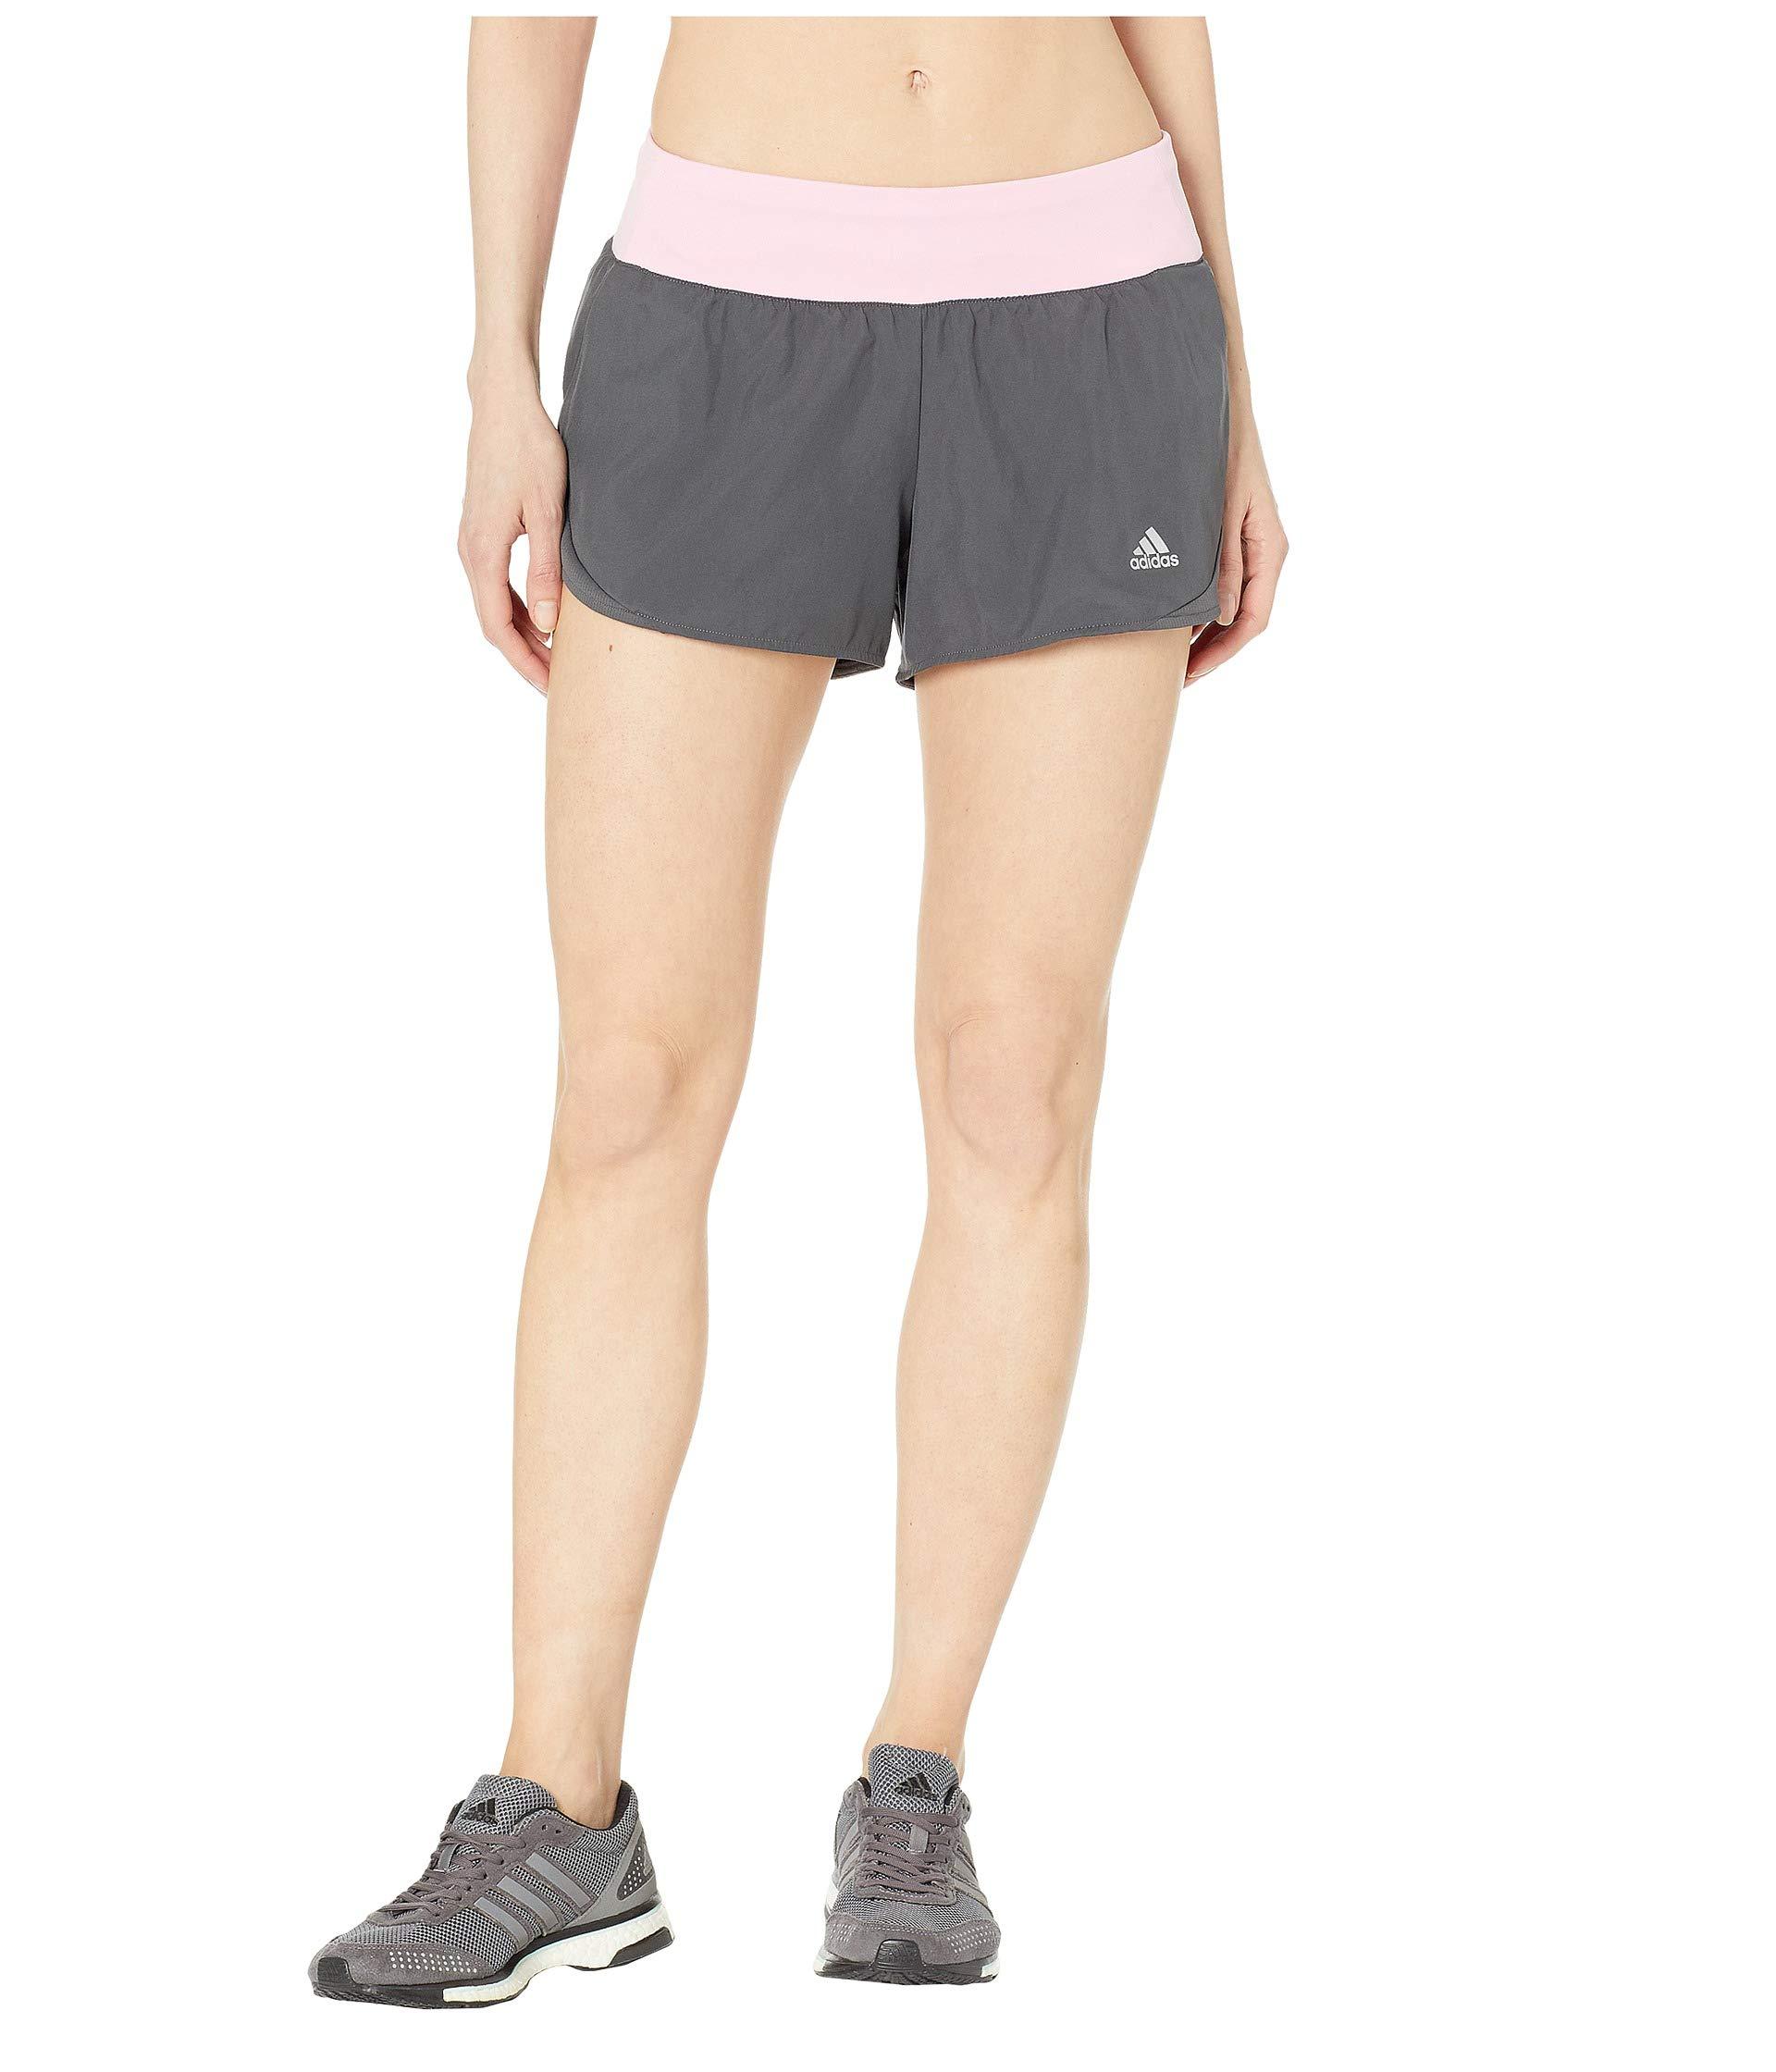 adidas Women's Run It Shorts, Grey/True Pink, X-Small 3''